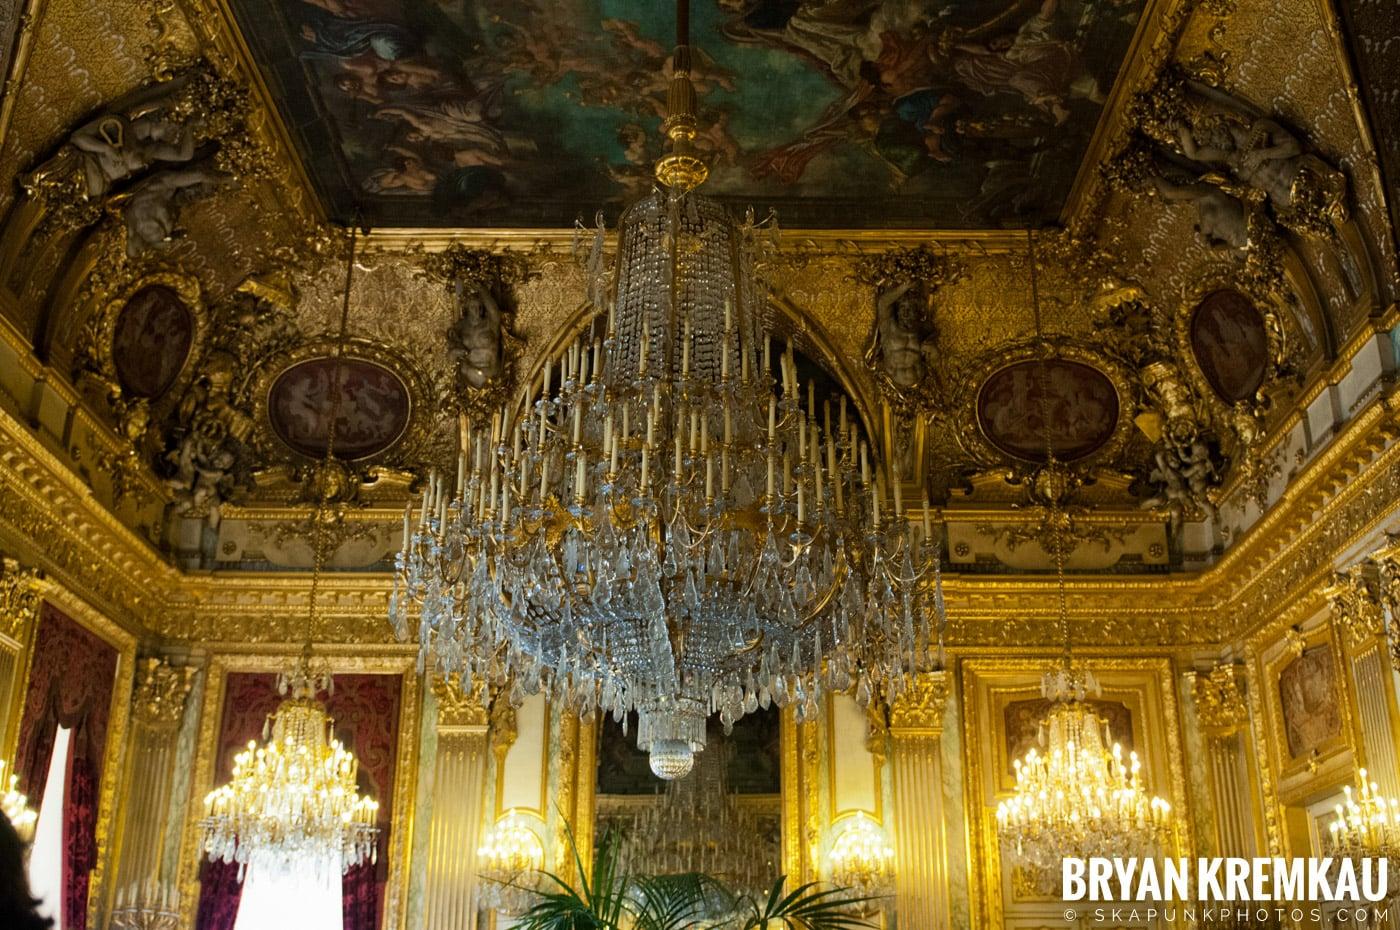 Paris, France Honeymoon - Day 3 - 7.20.11 (65)